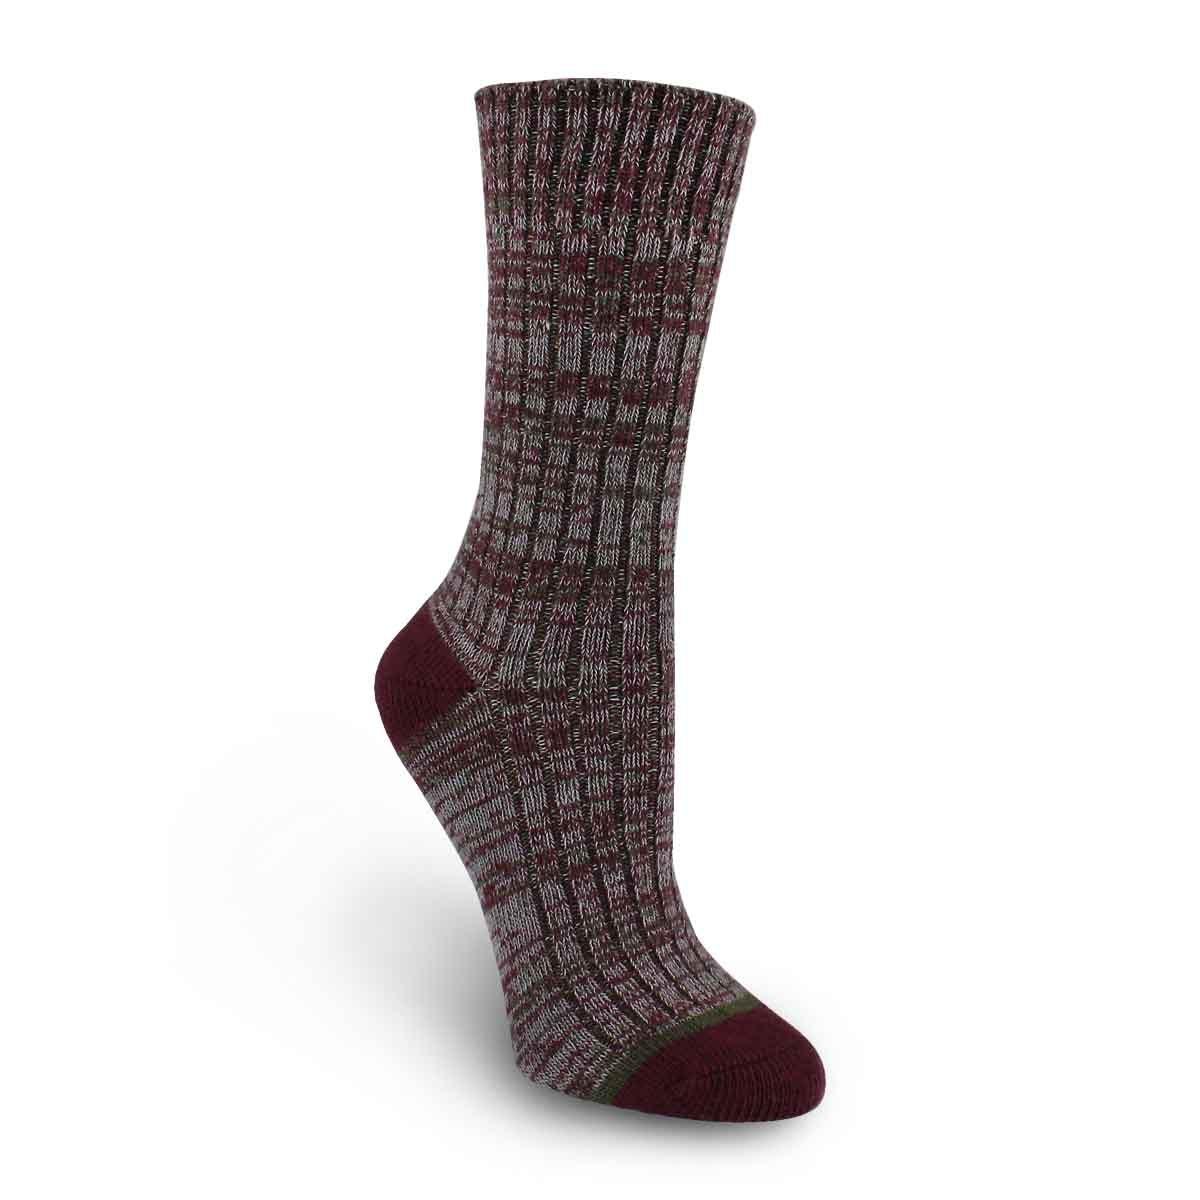 Lds Spacedye wine/grey tall sock